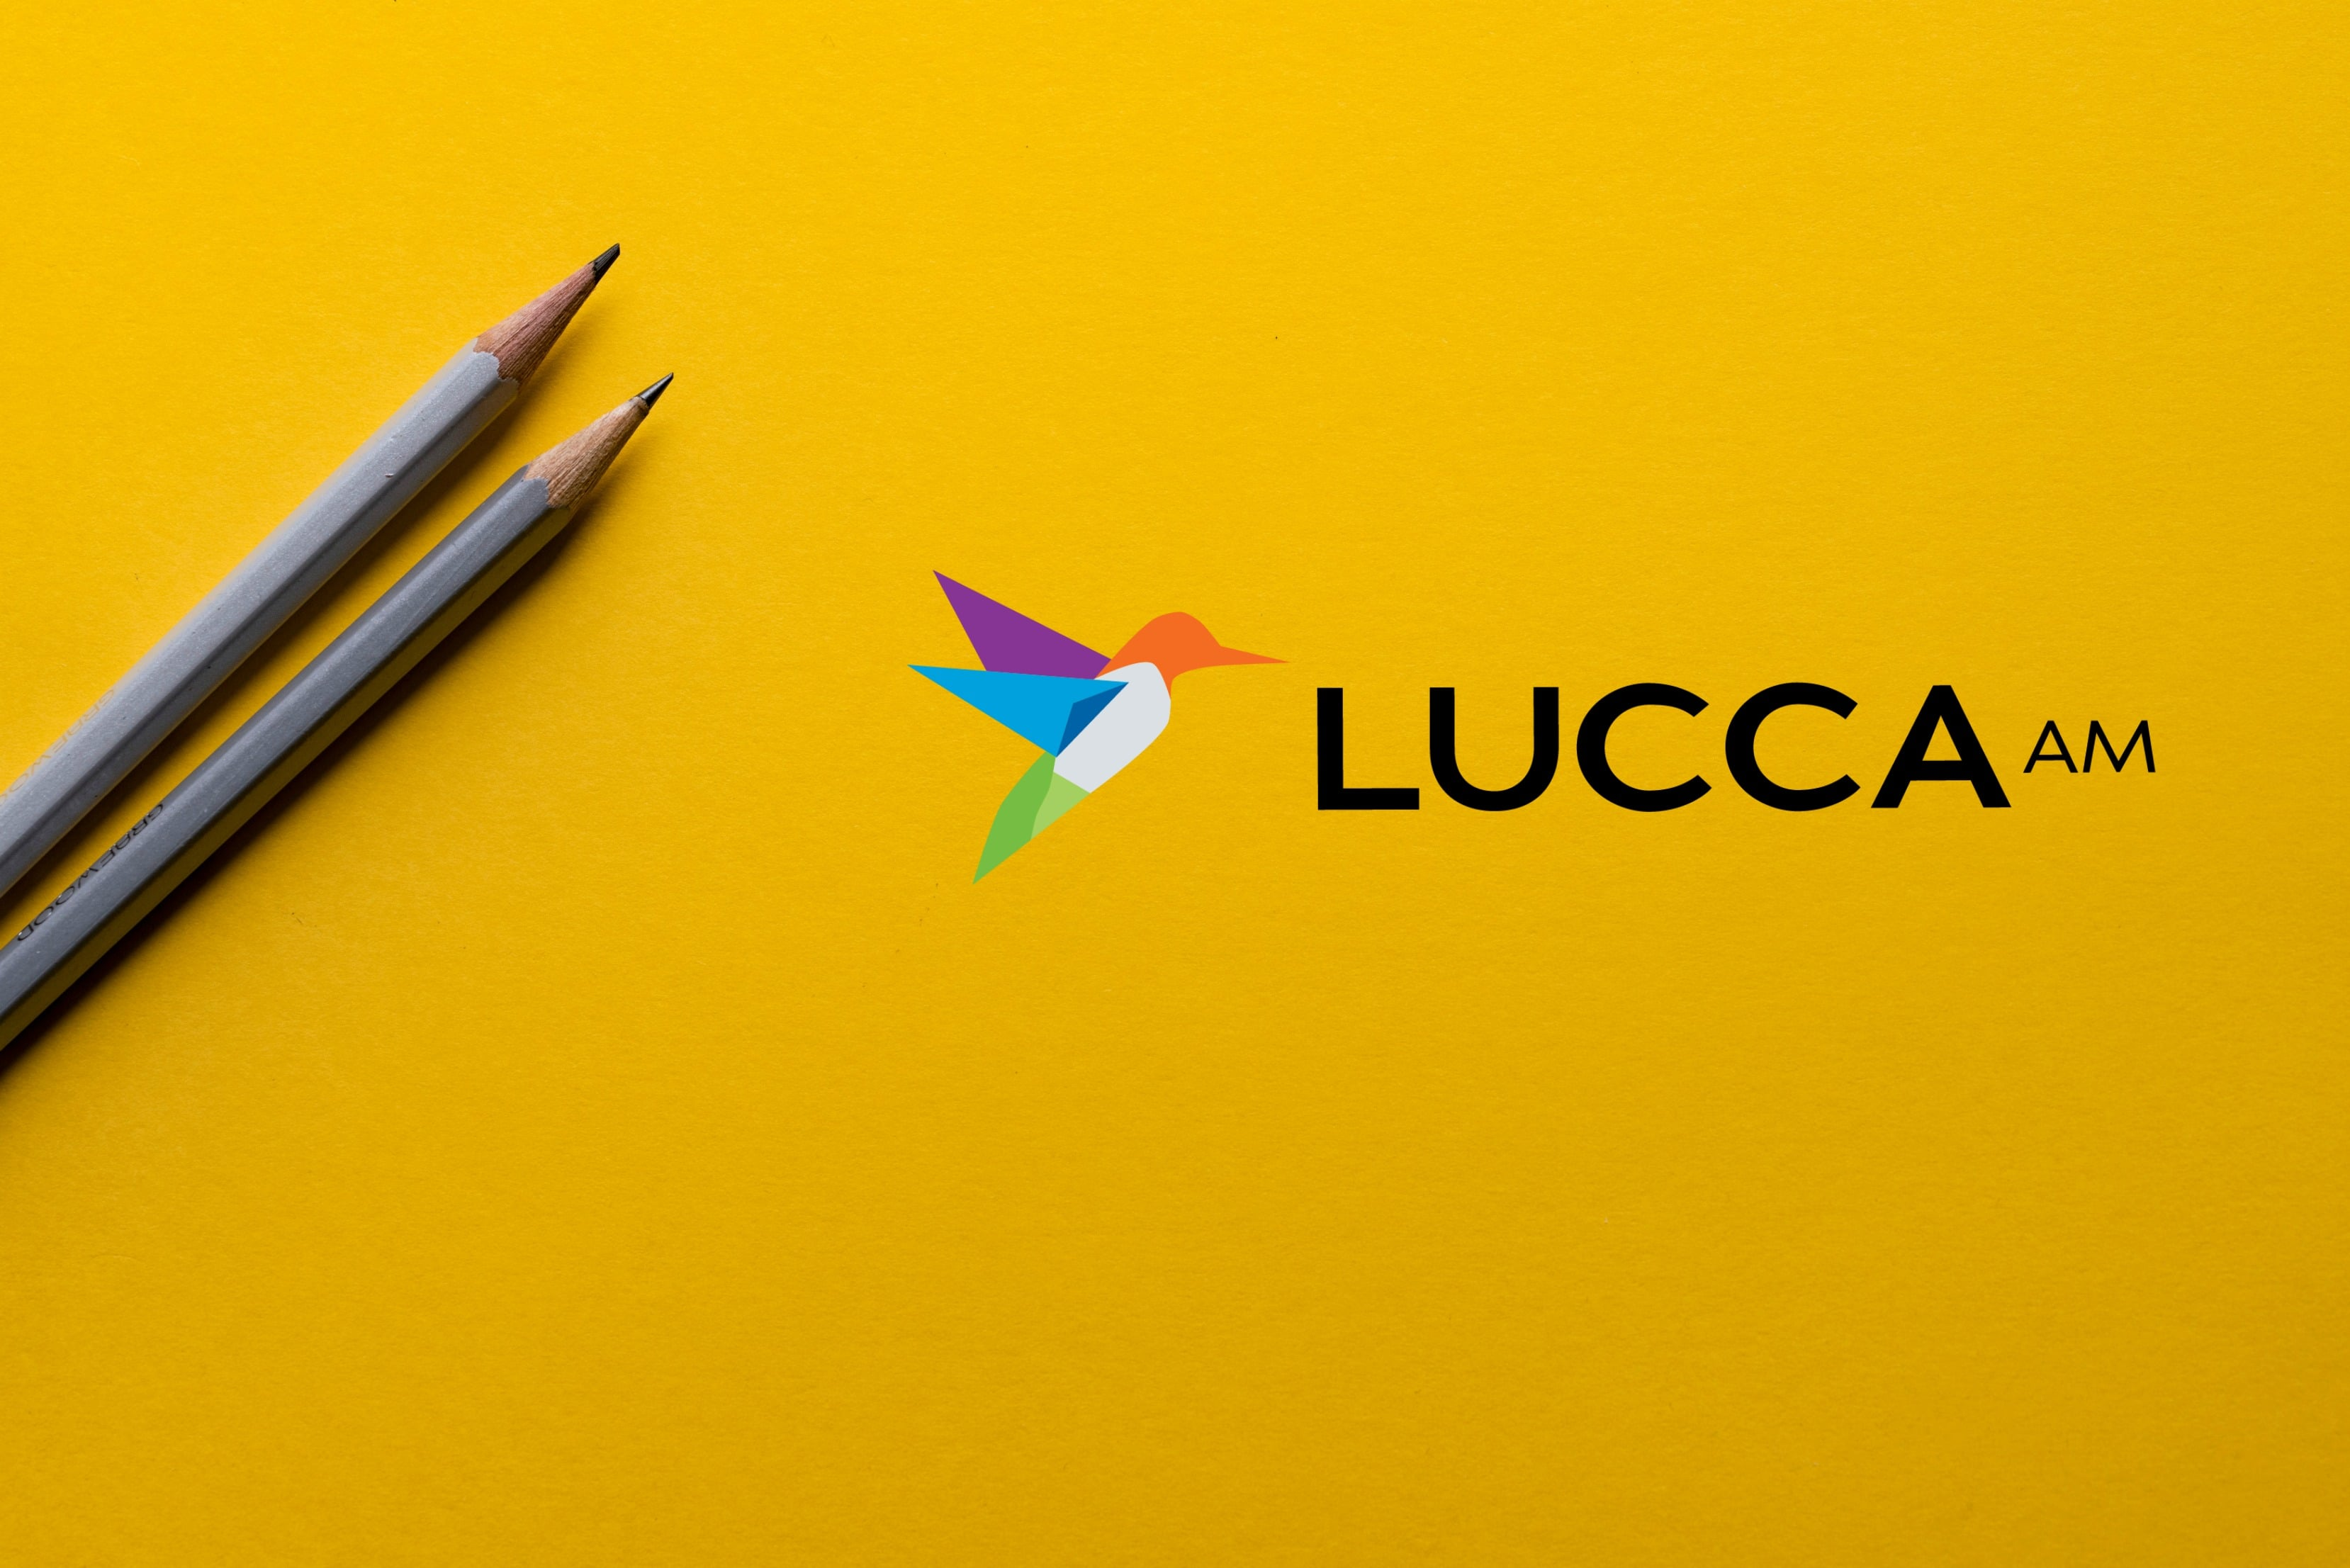 lucca am - design terms